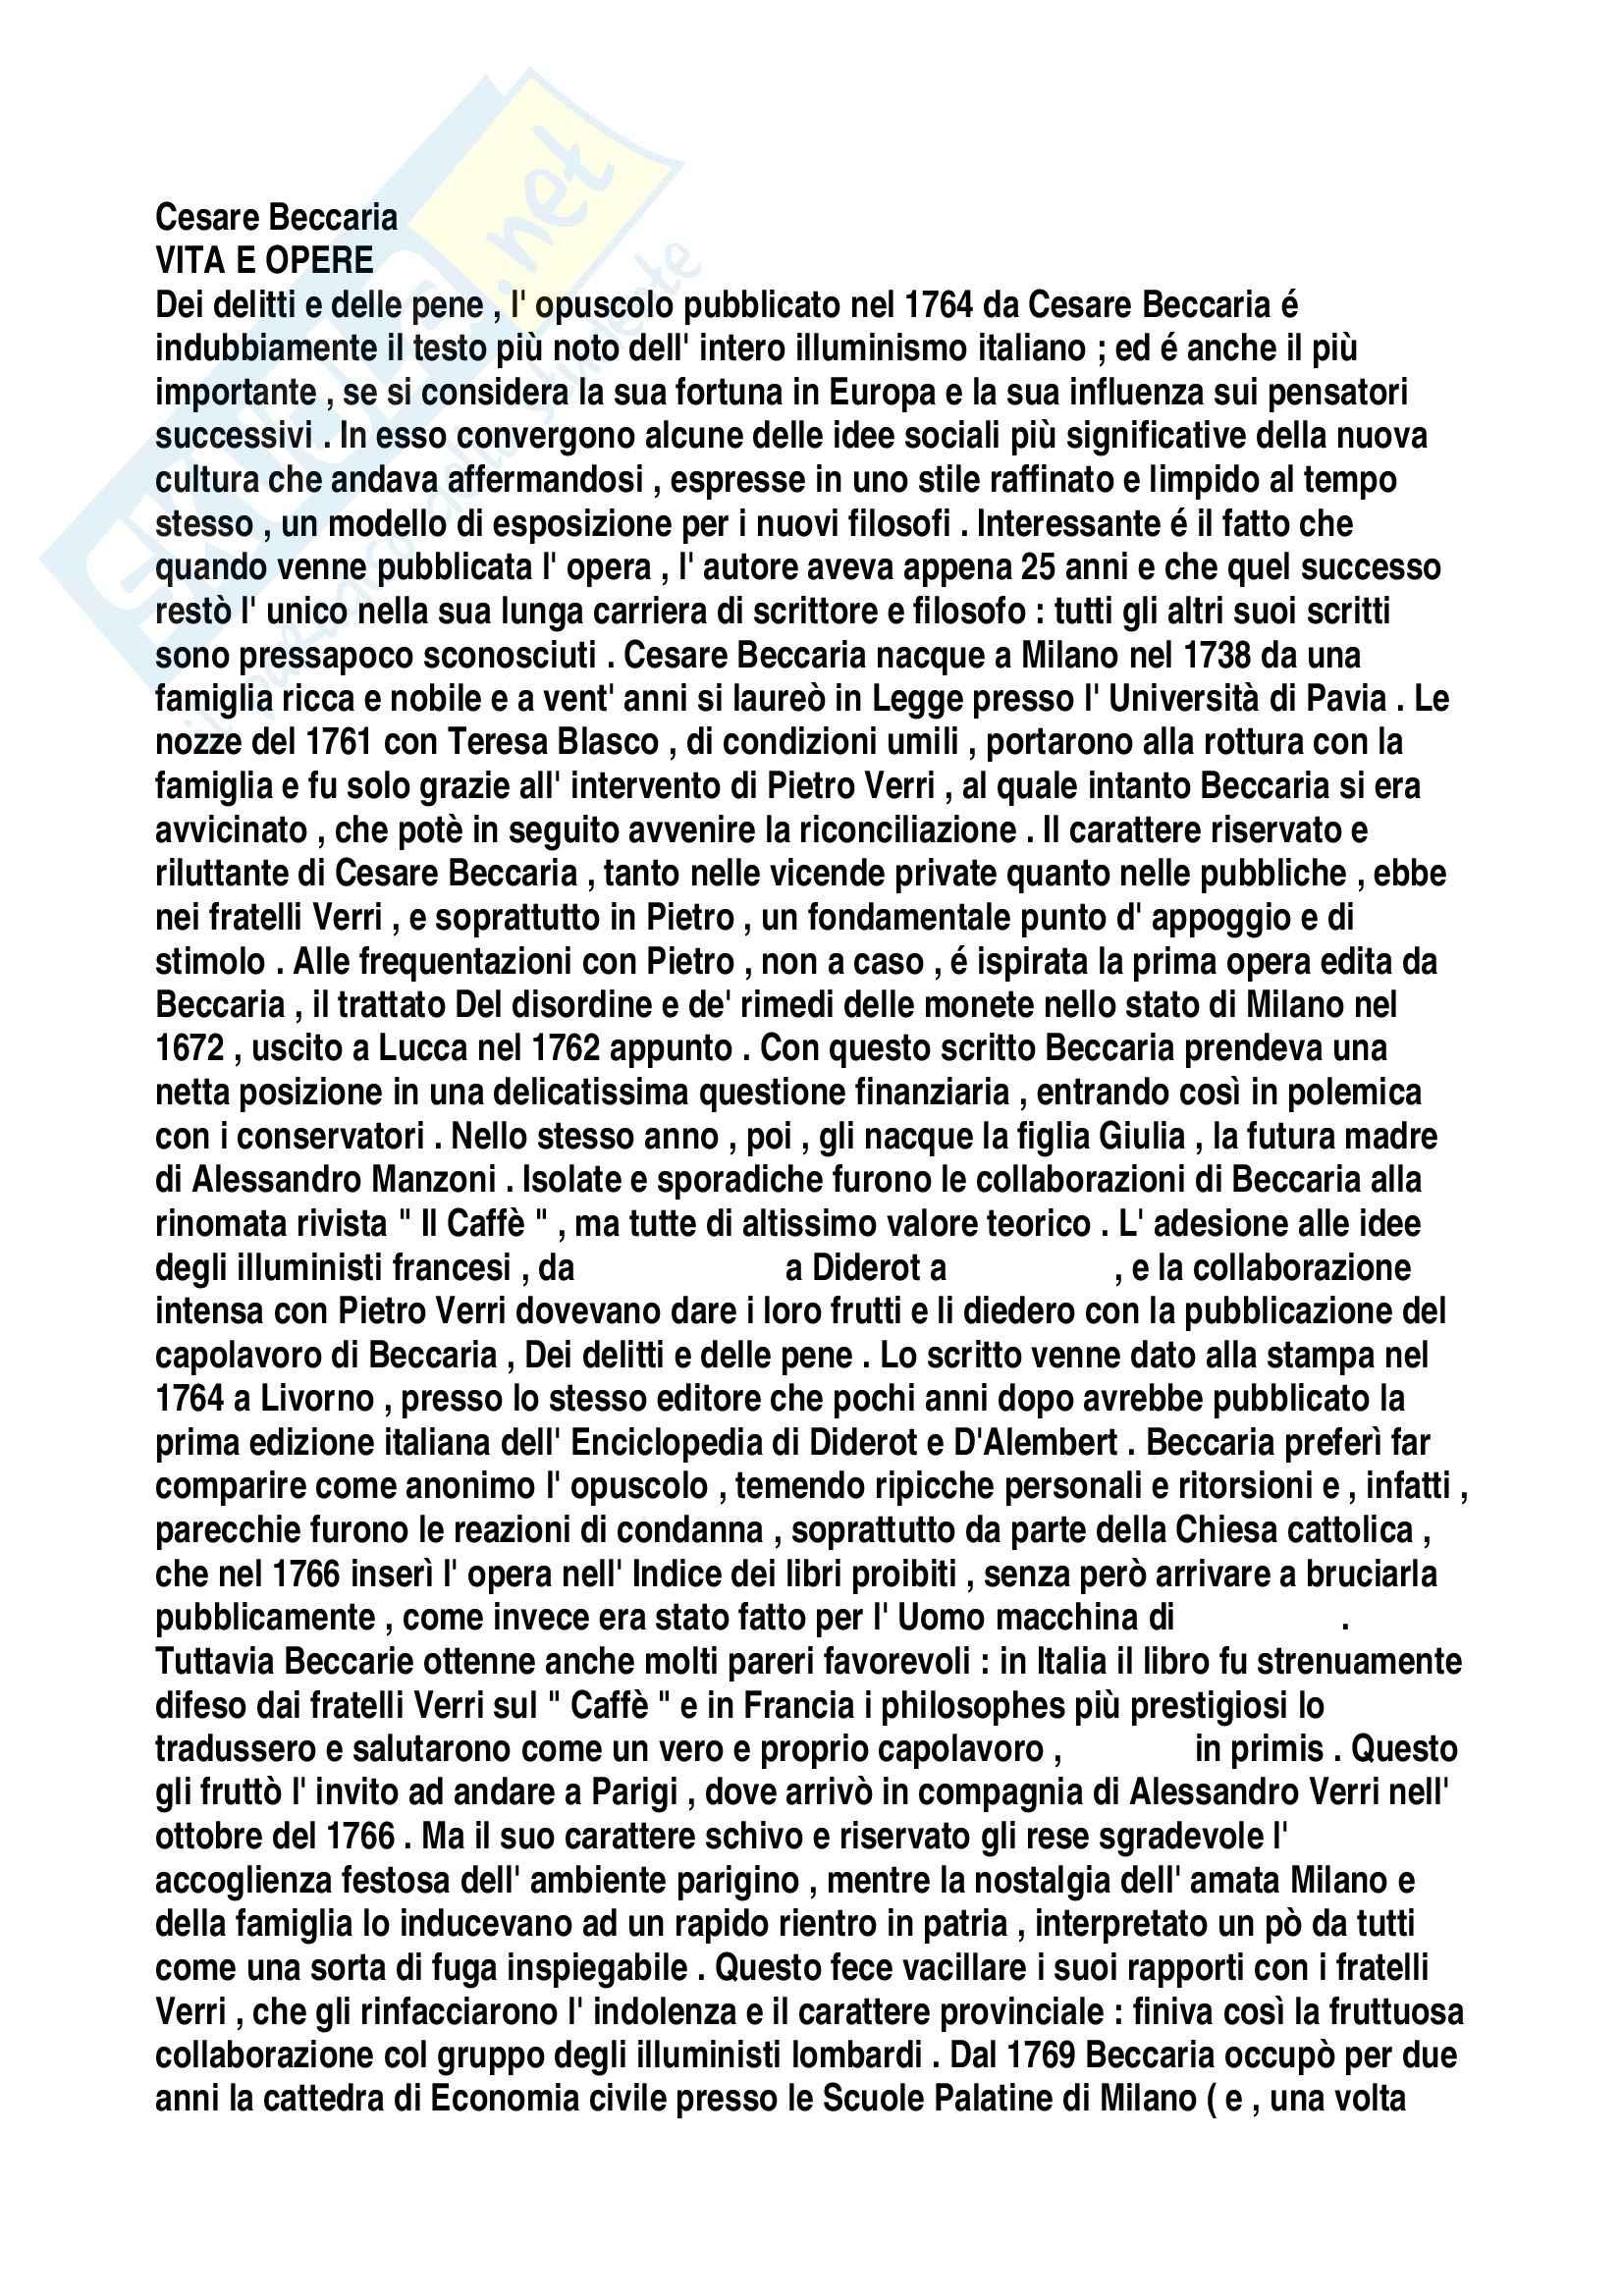 Diritto penale - Tesi su Cesare Beccaria